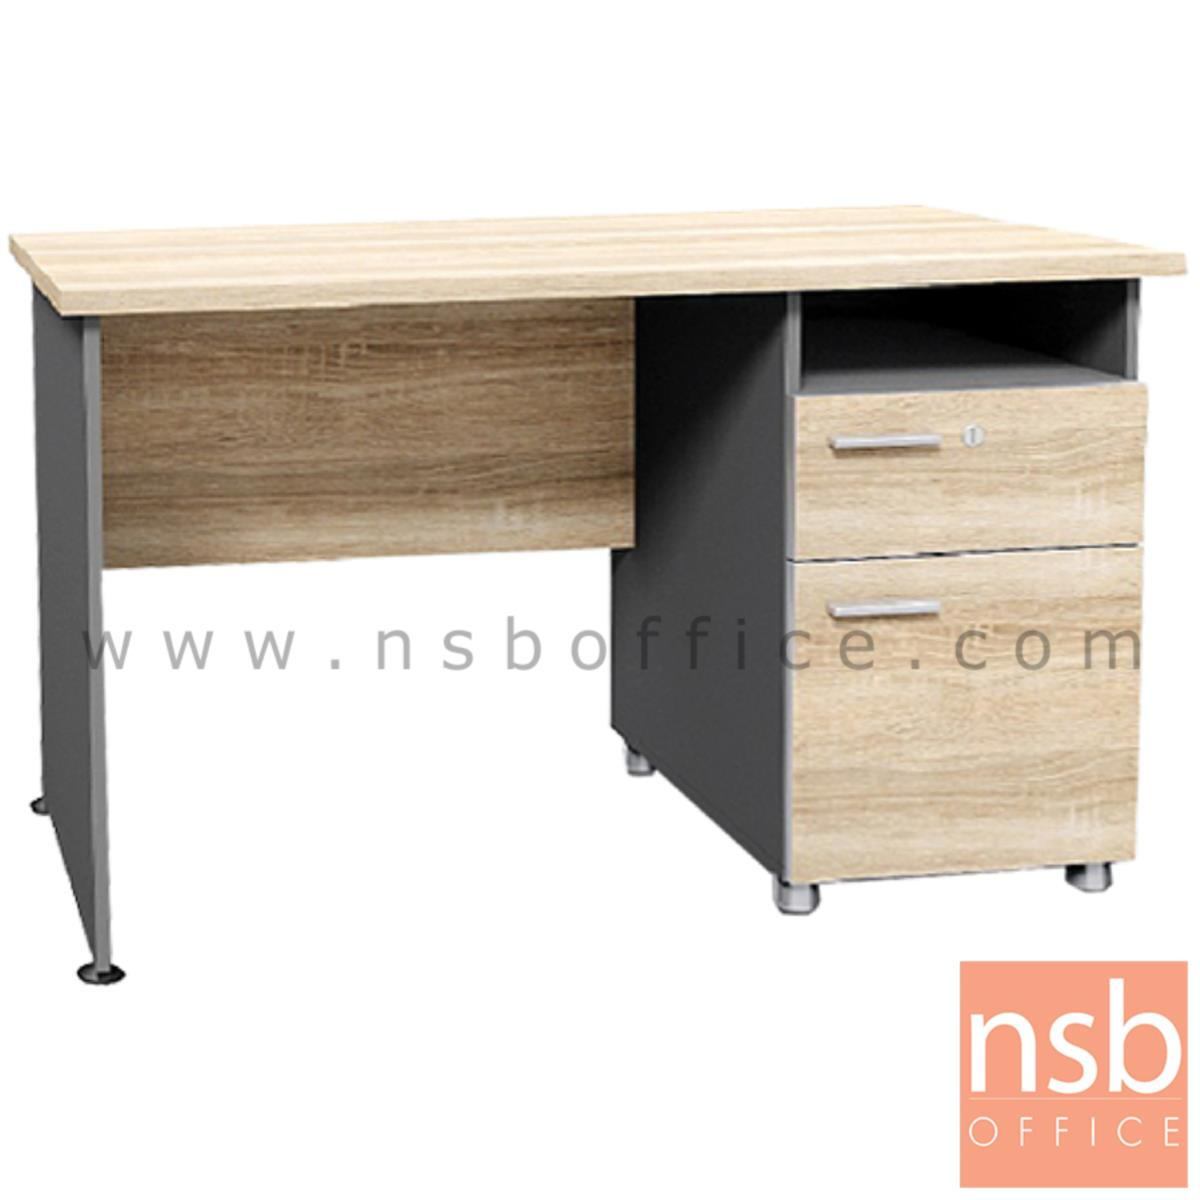 A13A193:โต๊ะทำงาน 2 ลิ้นชัก 1 ช่องโล่ง  รุ่น DKK-1202  ขนาด 120W cm. สีแกรนโอ๊คตัดกราไฟท์